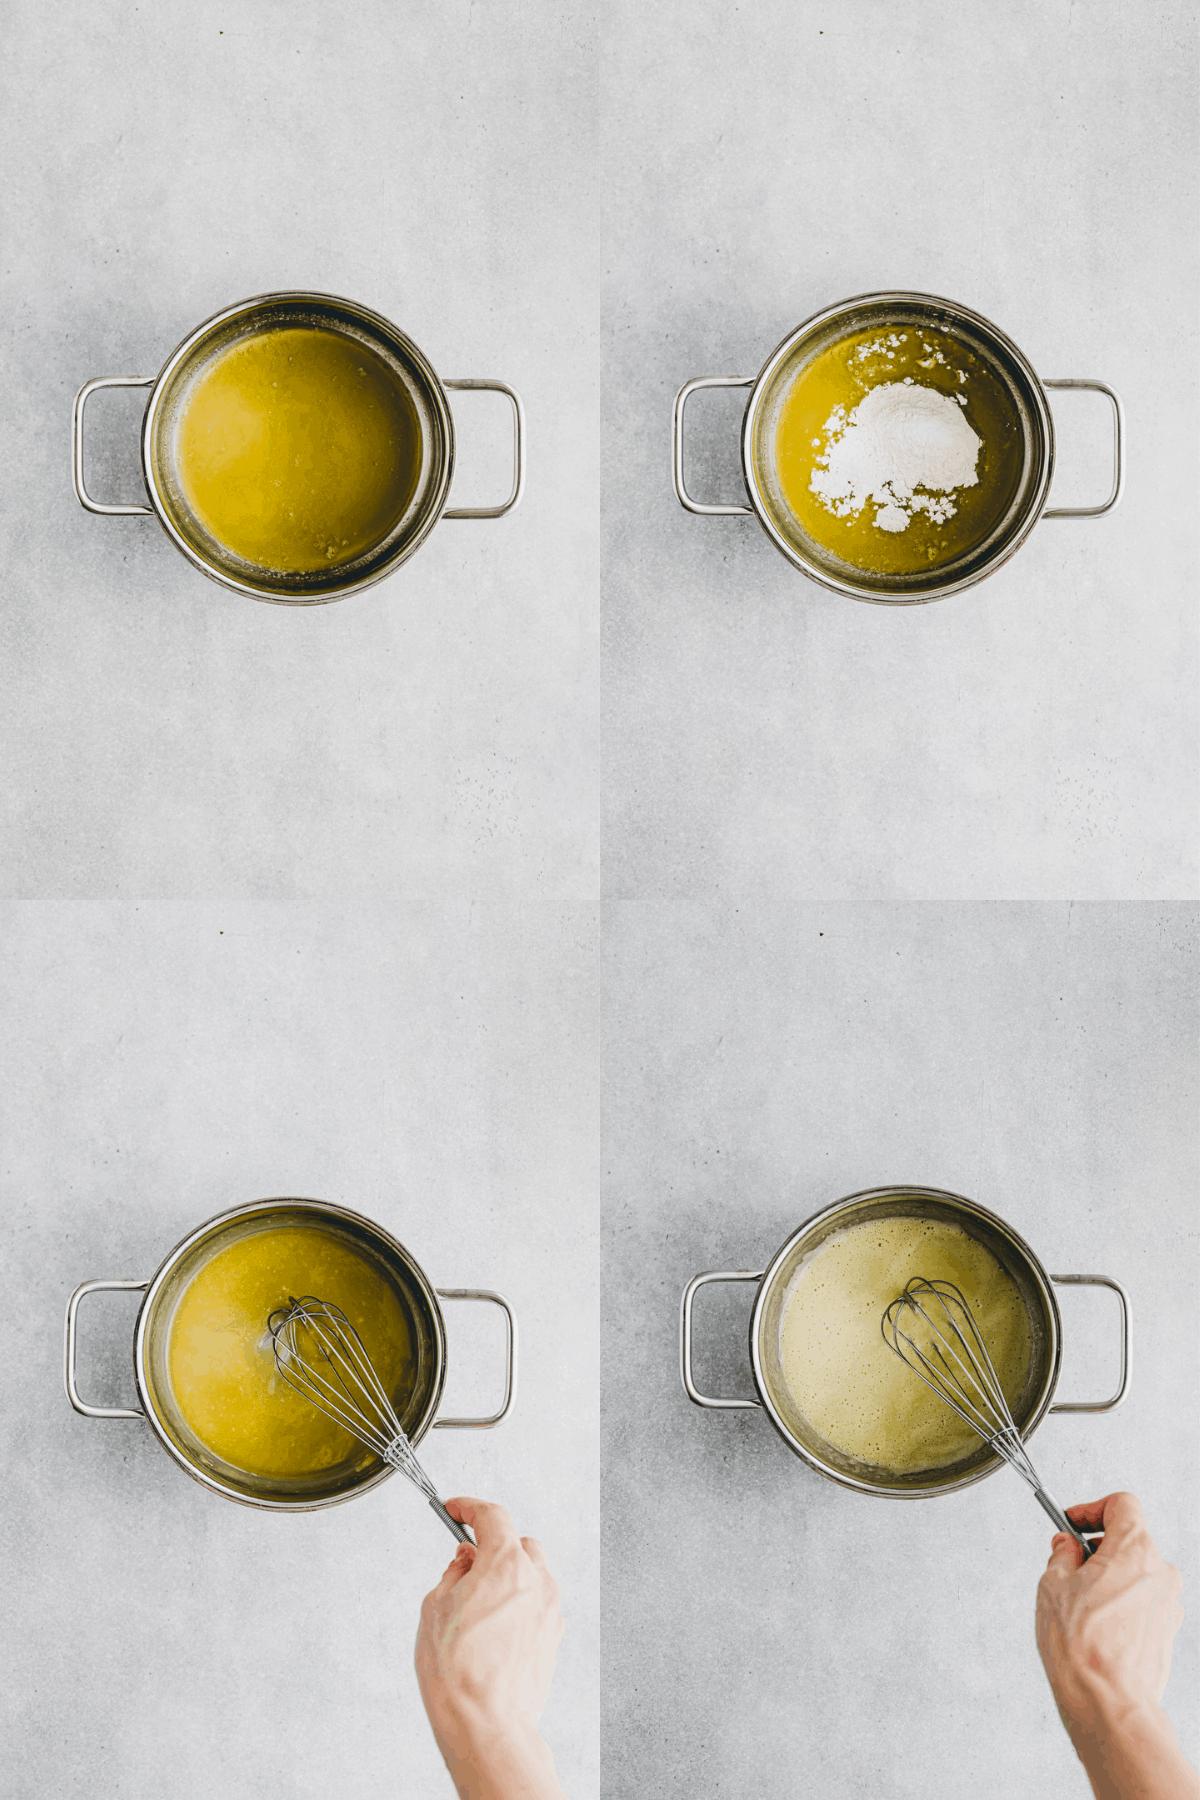 vegan bechamel sauce recipe step 1-4